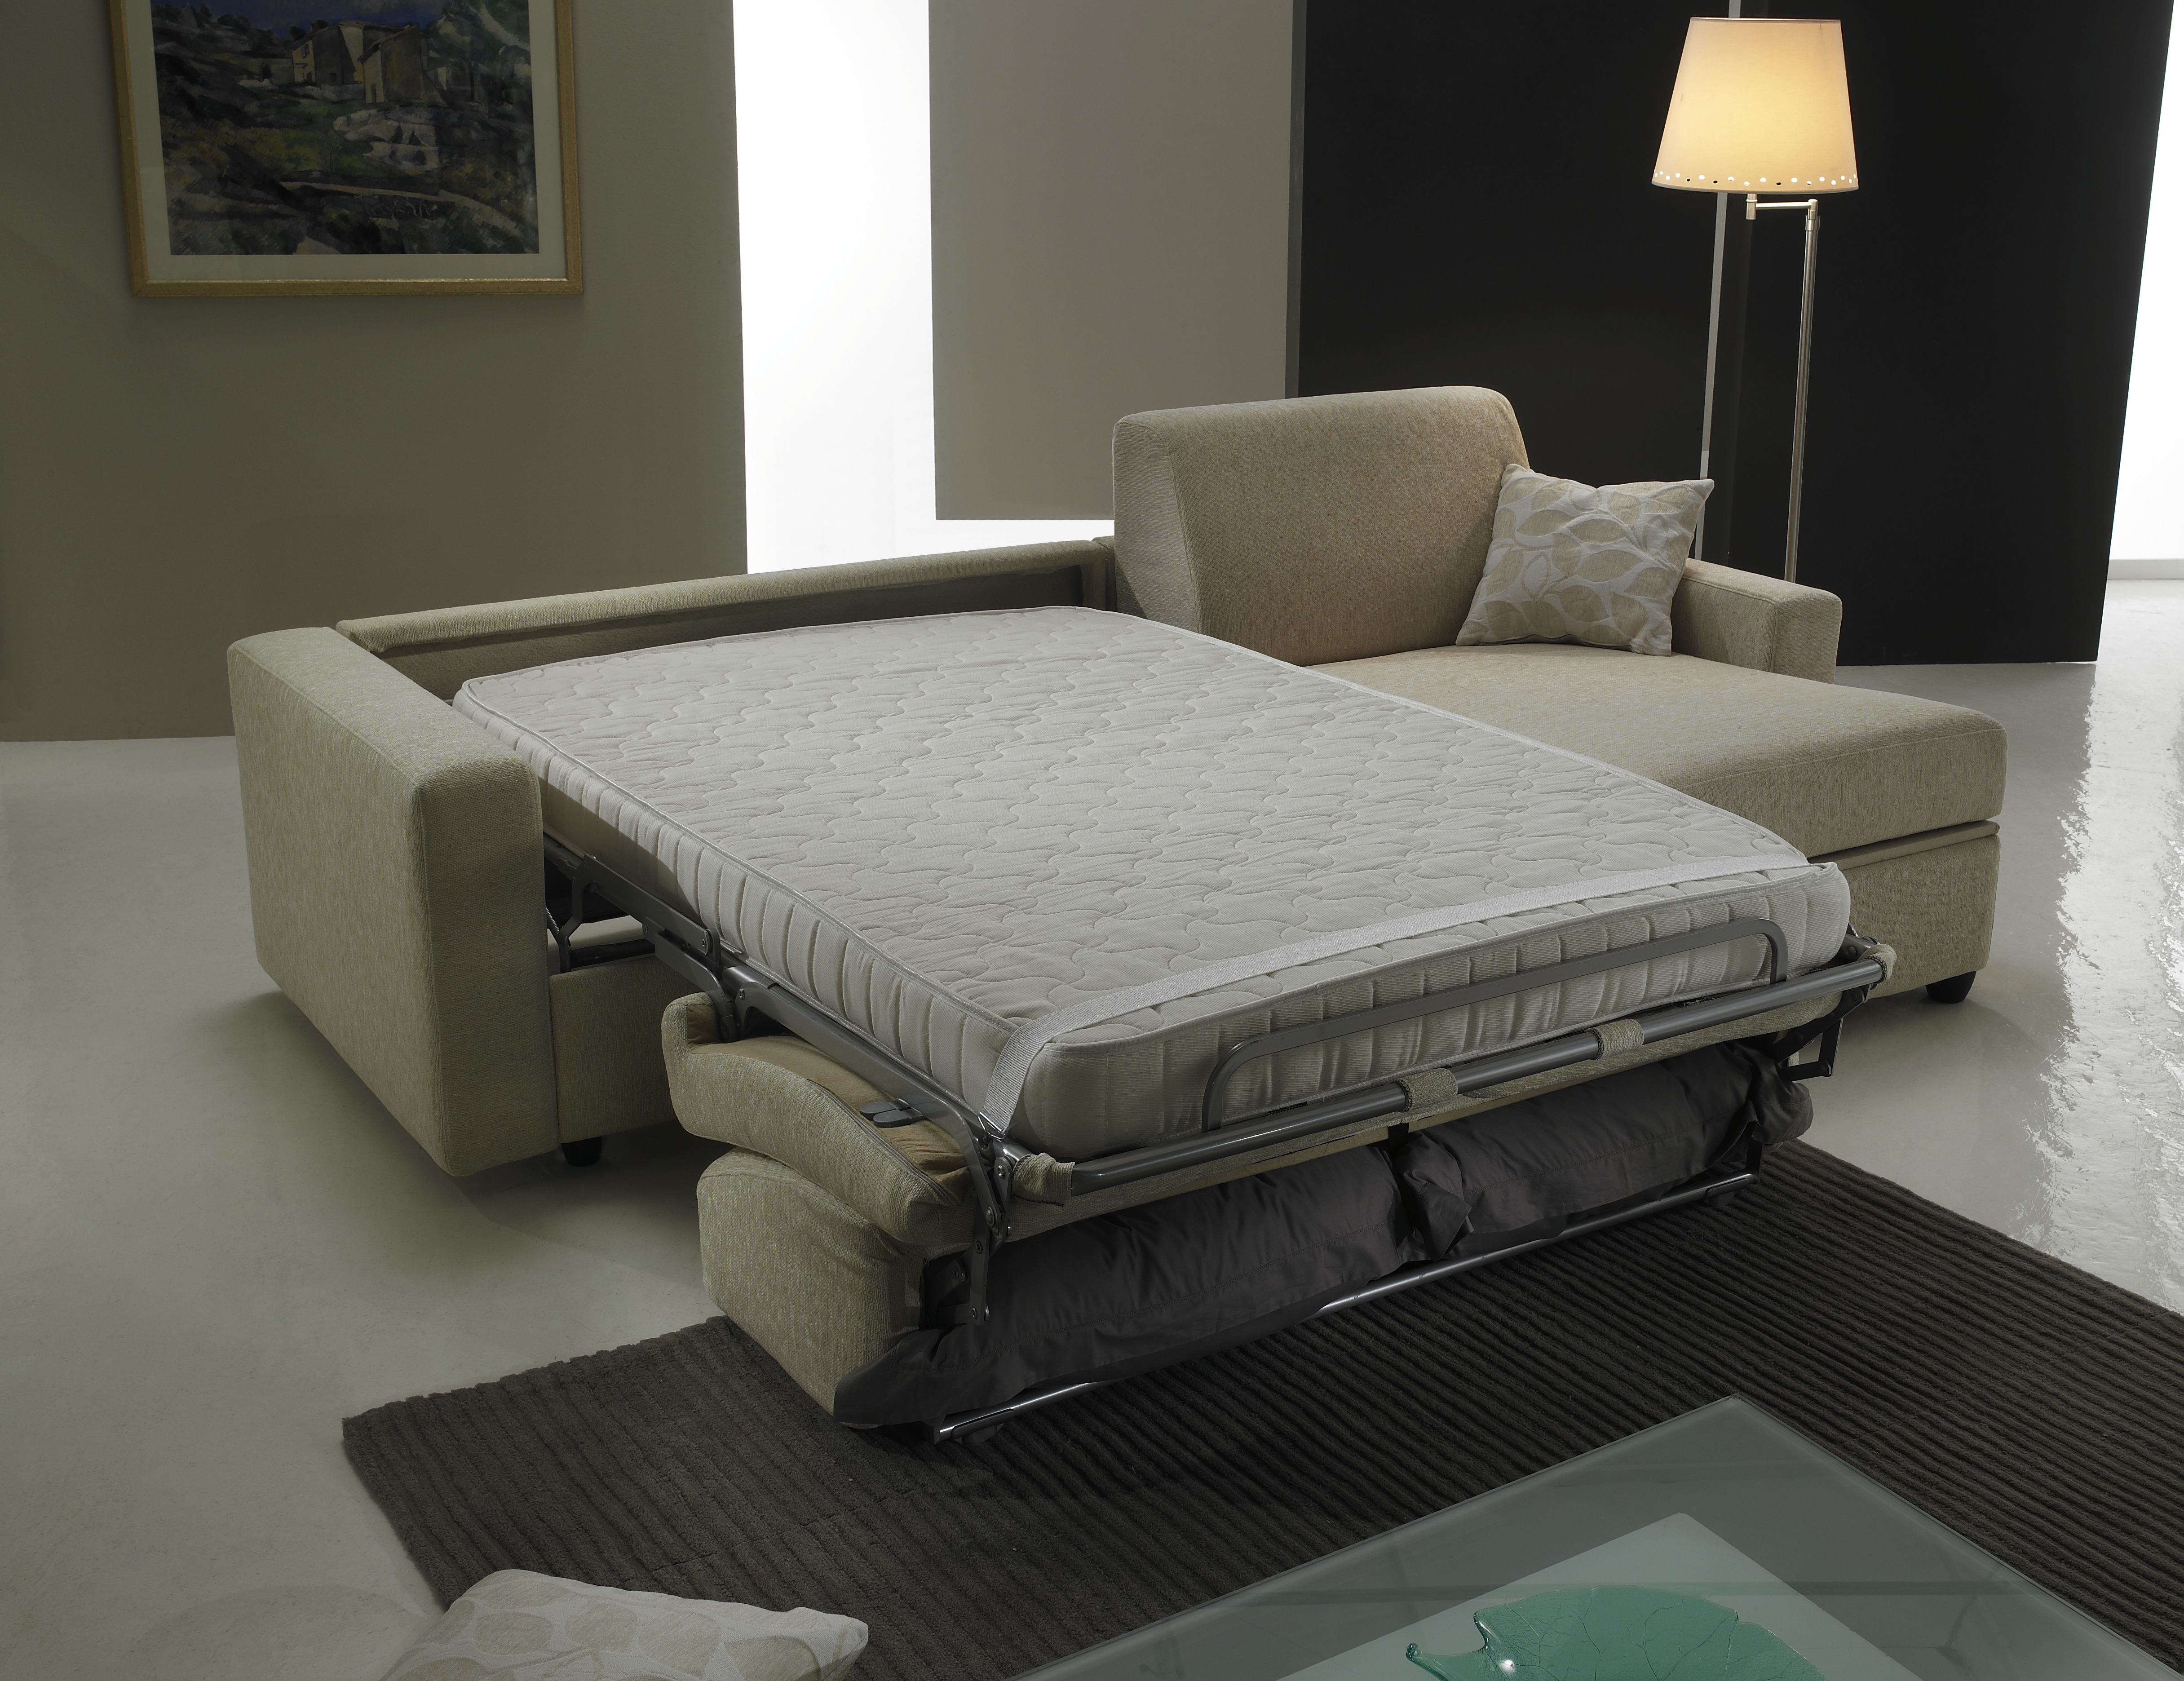 Ecorapide ספה נפתחת למיטה